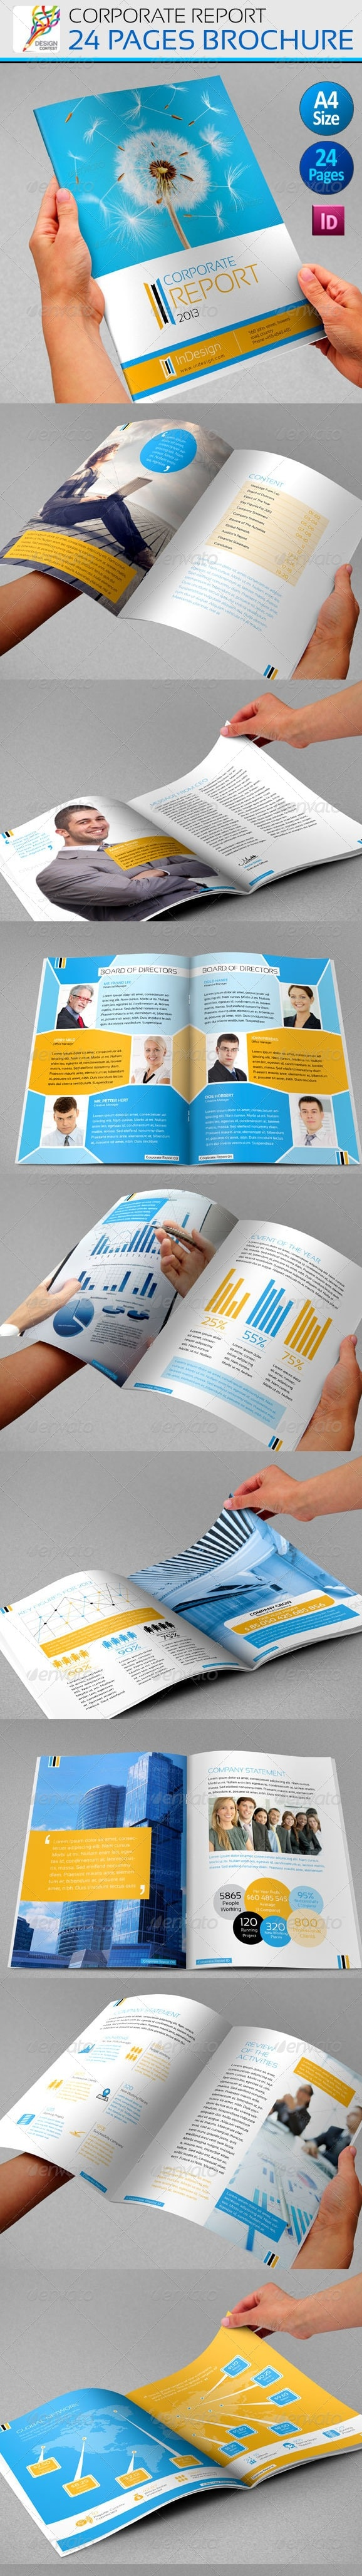 Corporate Annual Report - Brochure